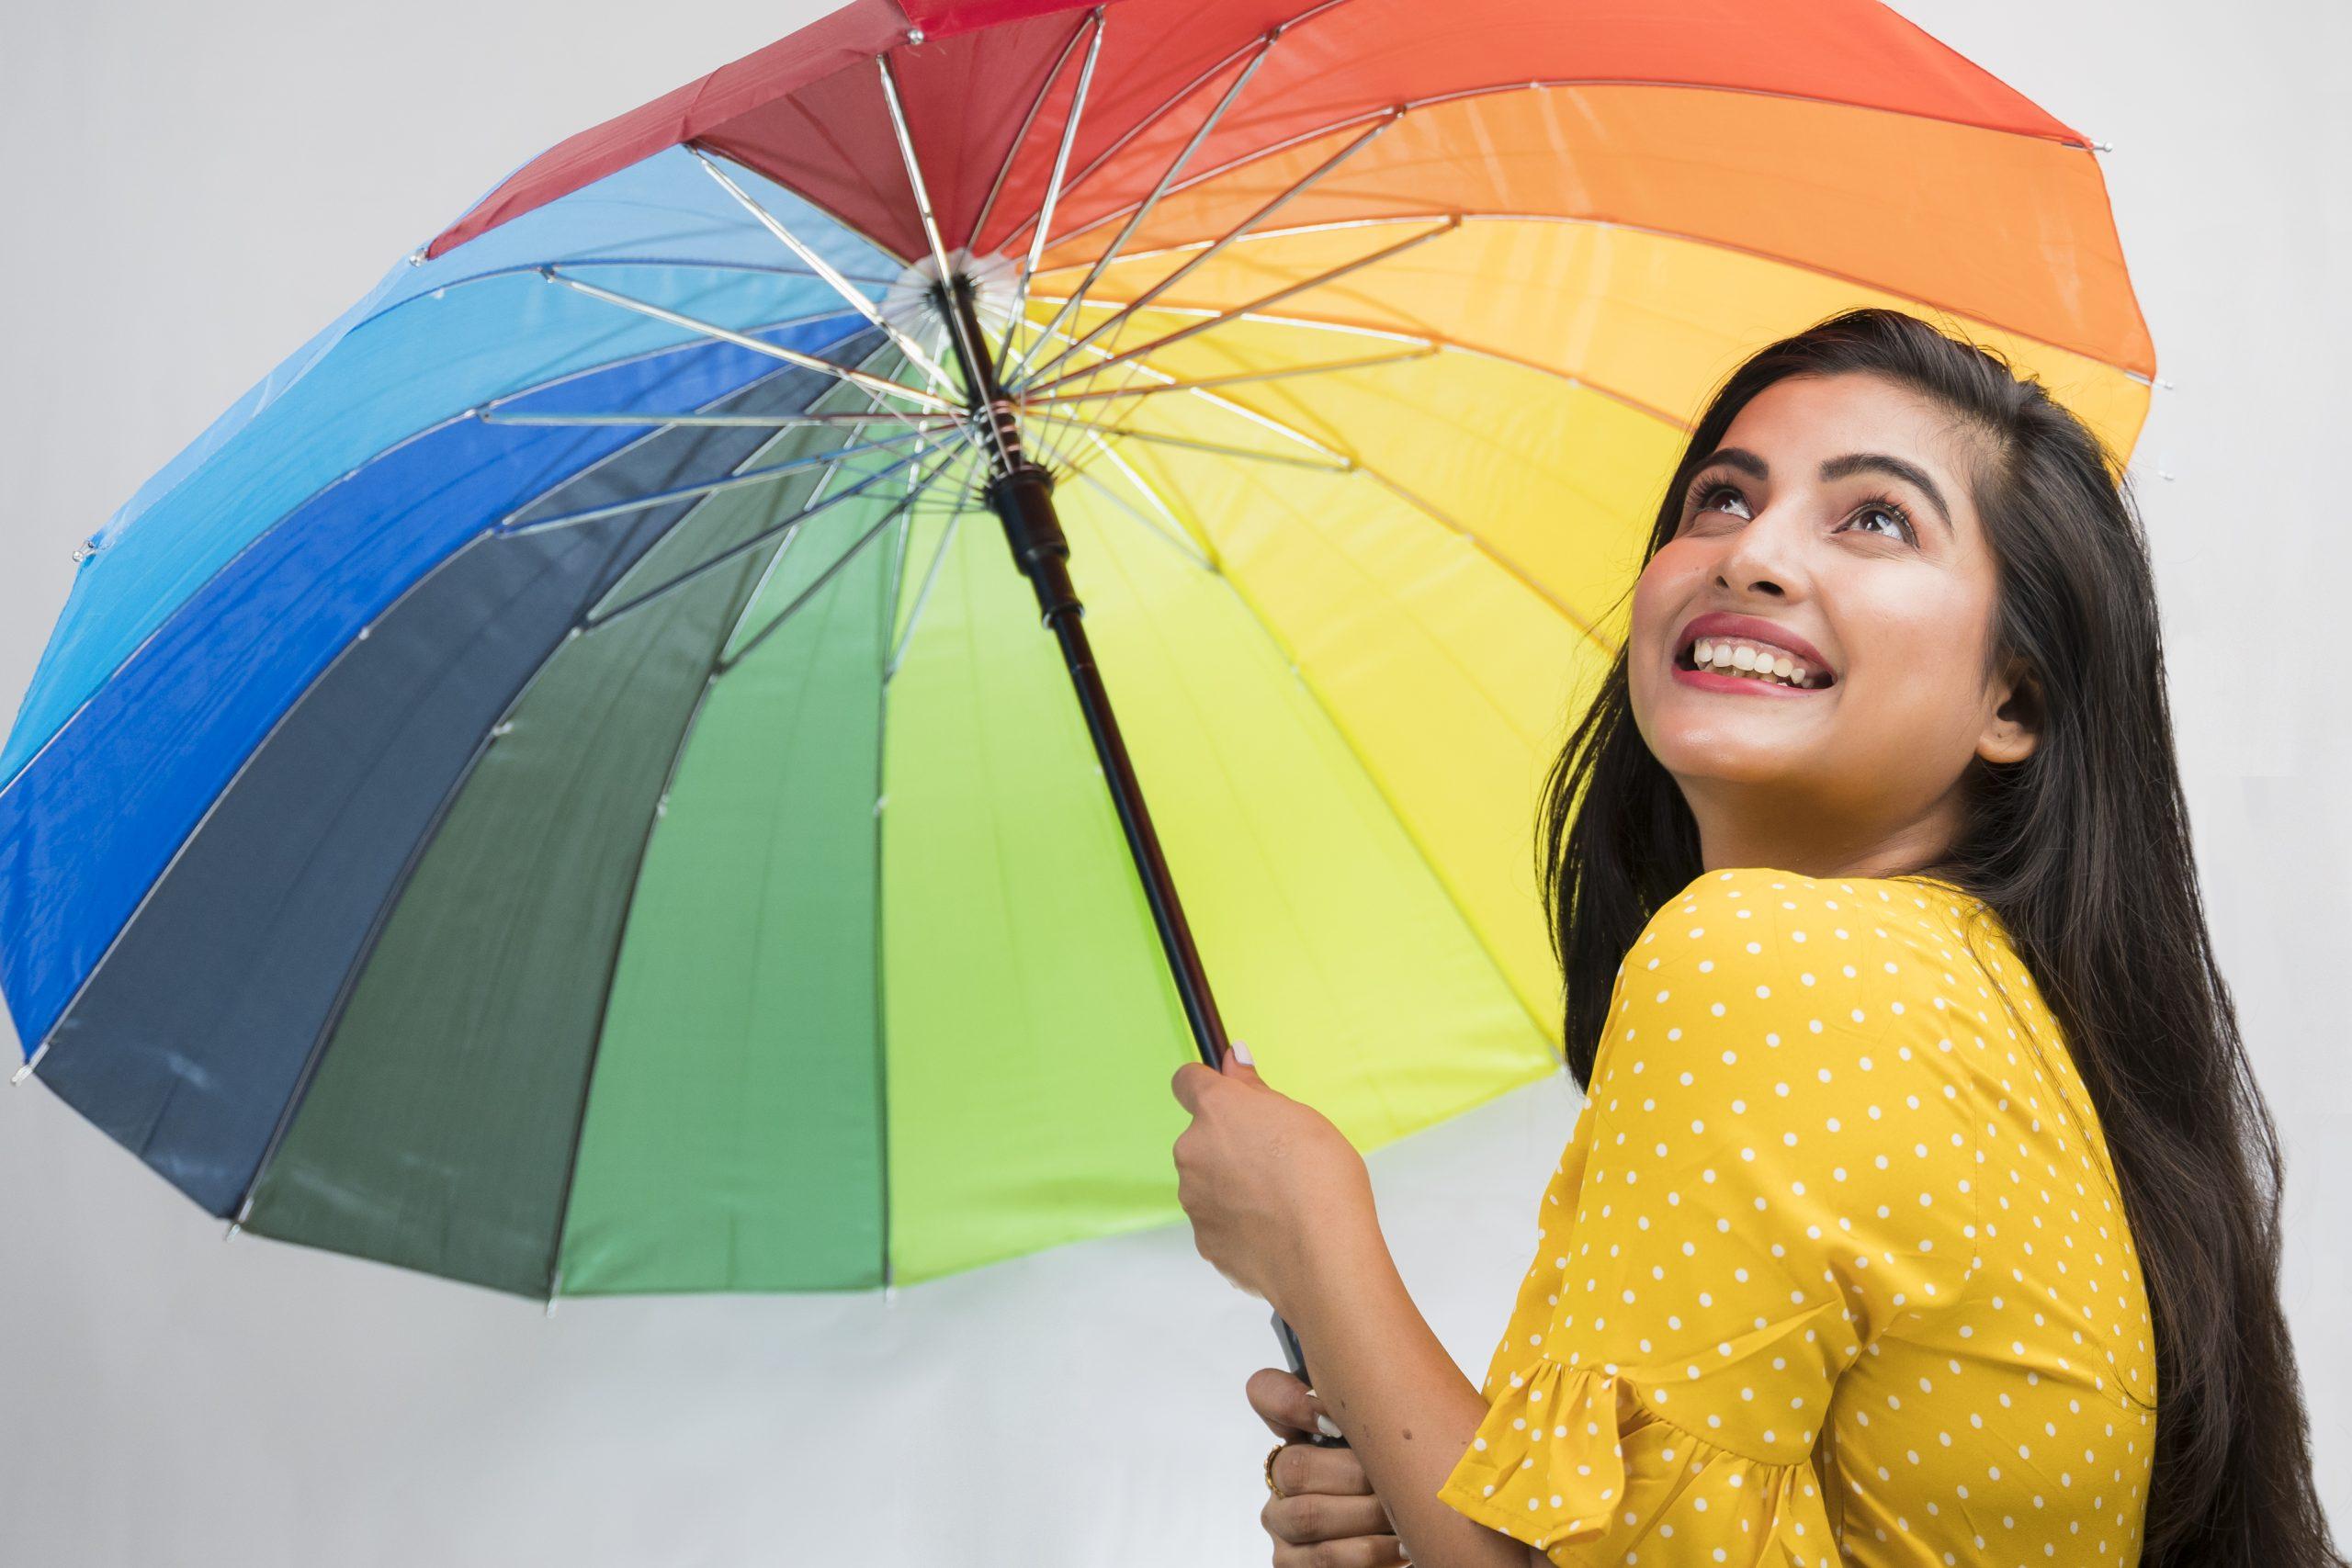 Girl with a colourful umbrella